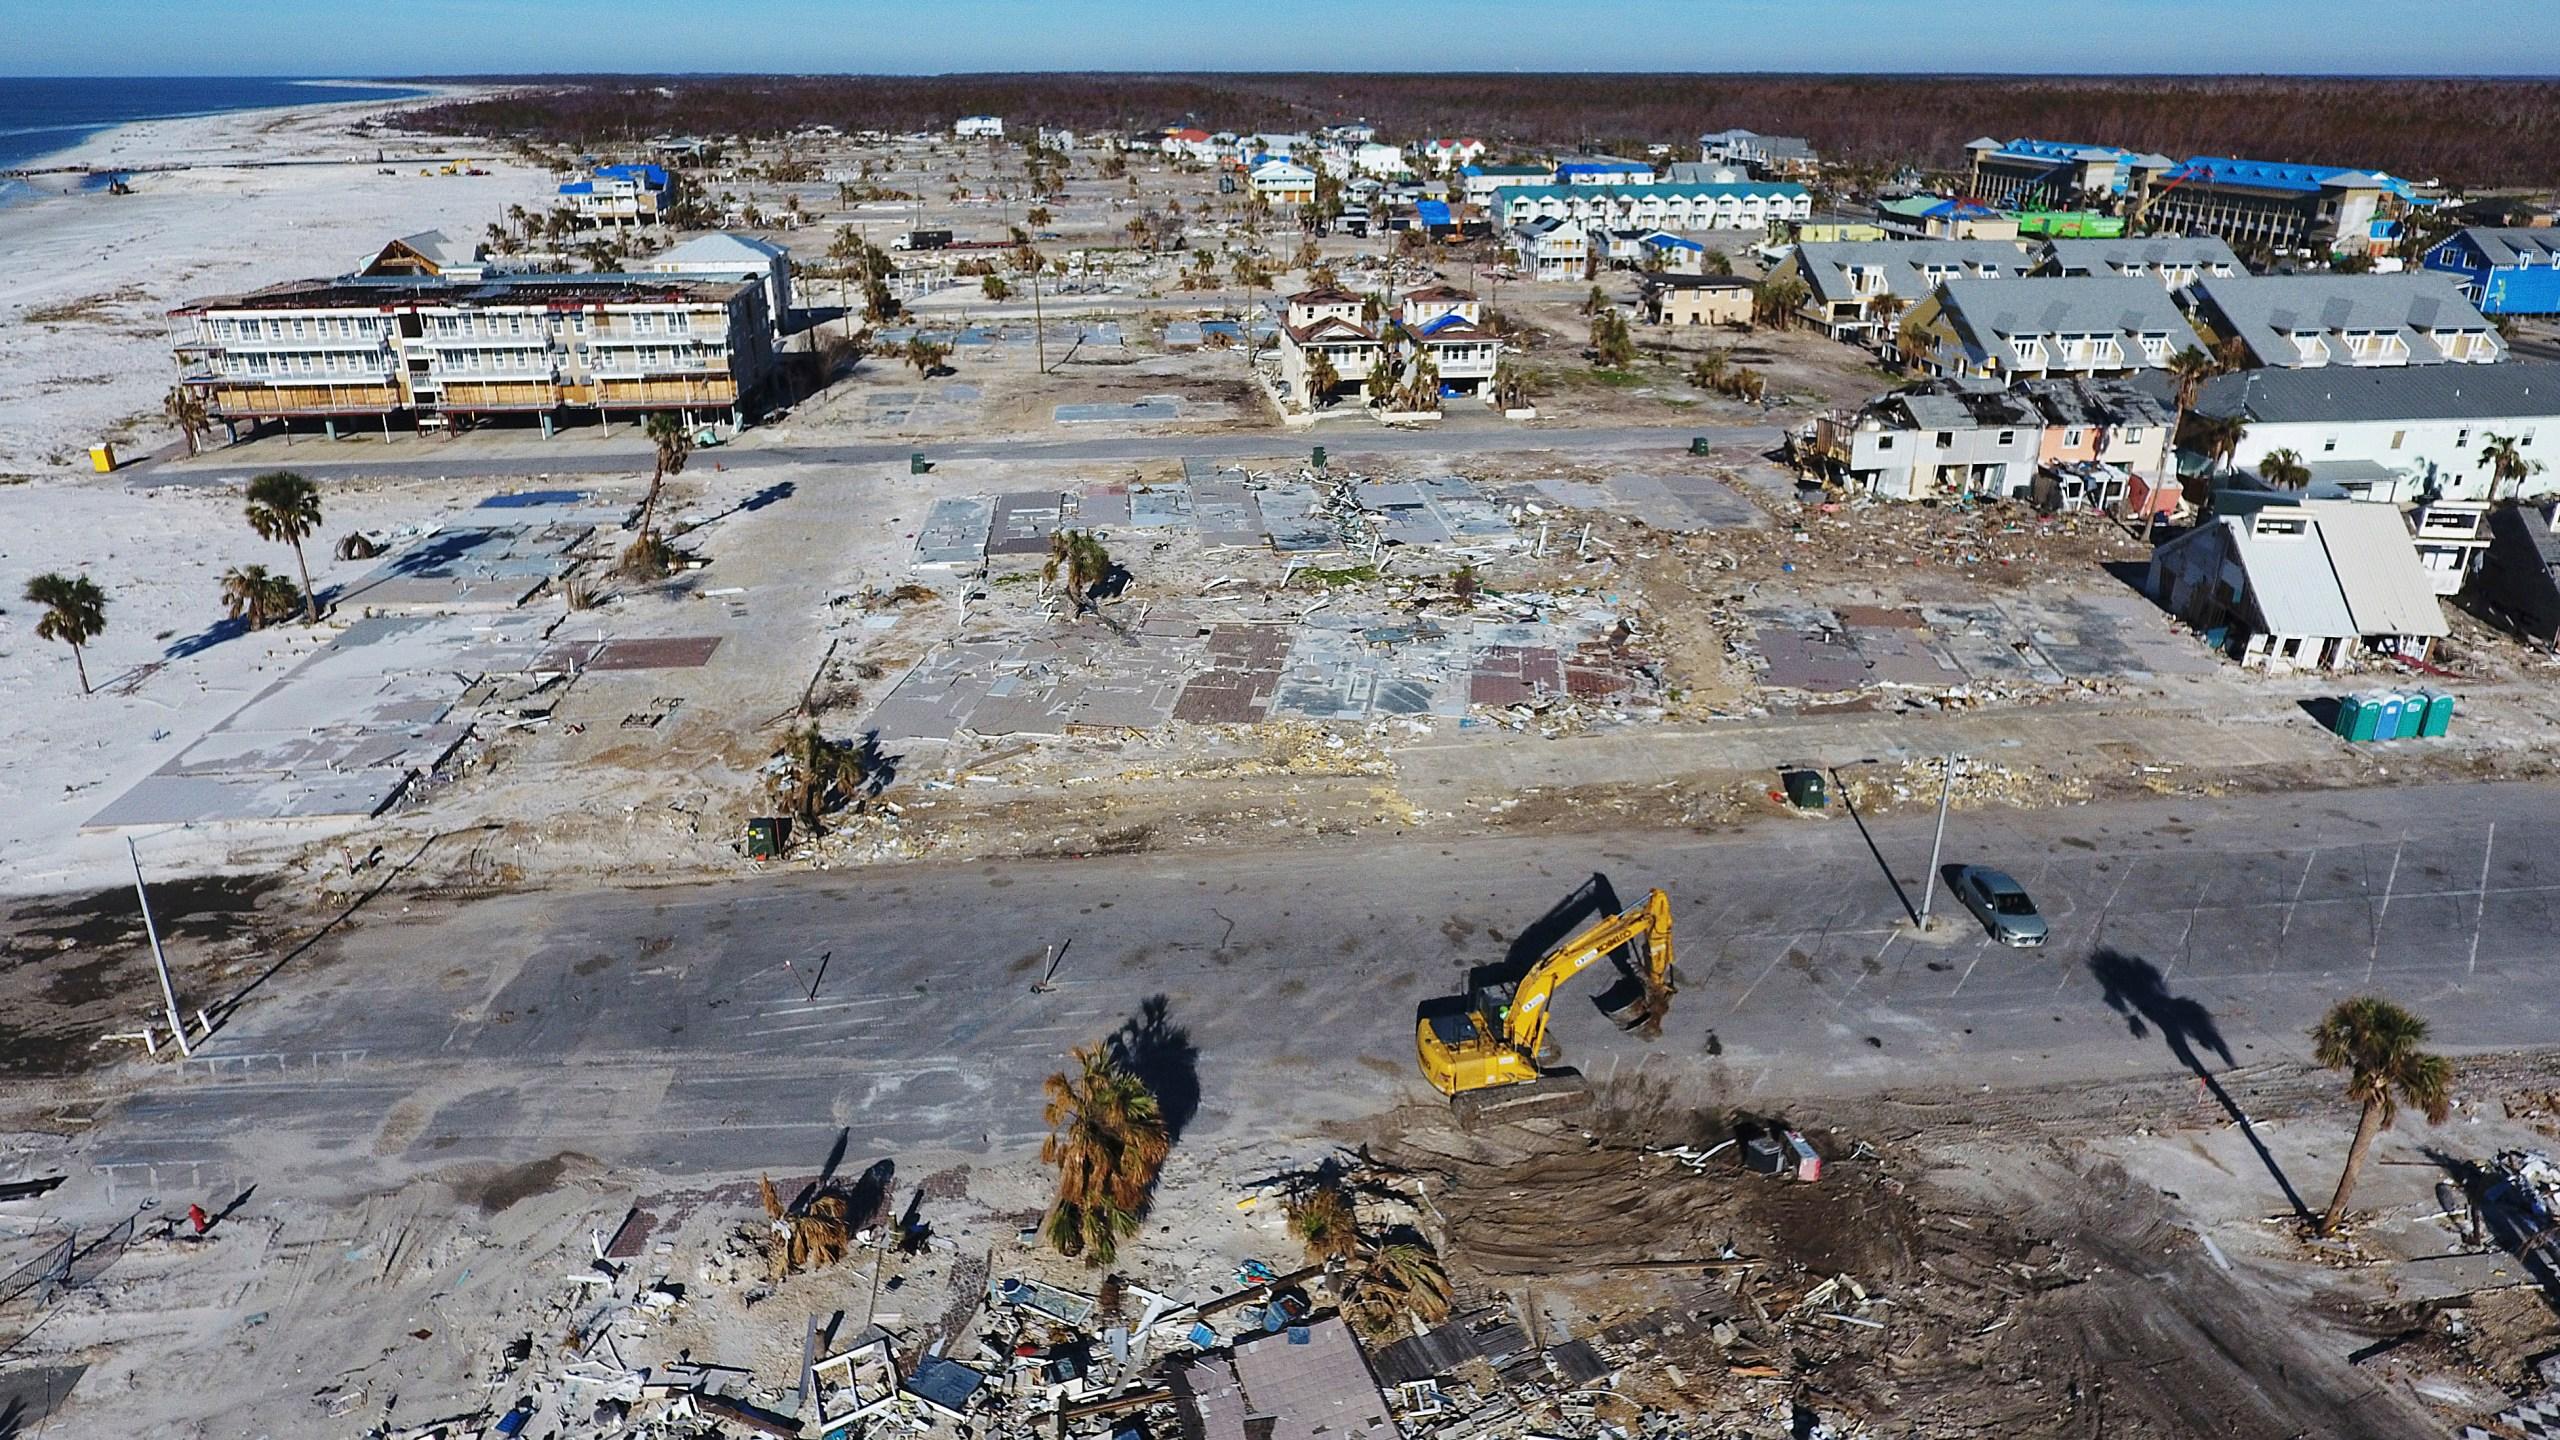 Hurricane_Michael_Everyday_Struggles_19939-159532.jpg61630874